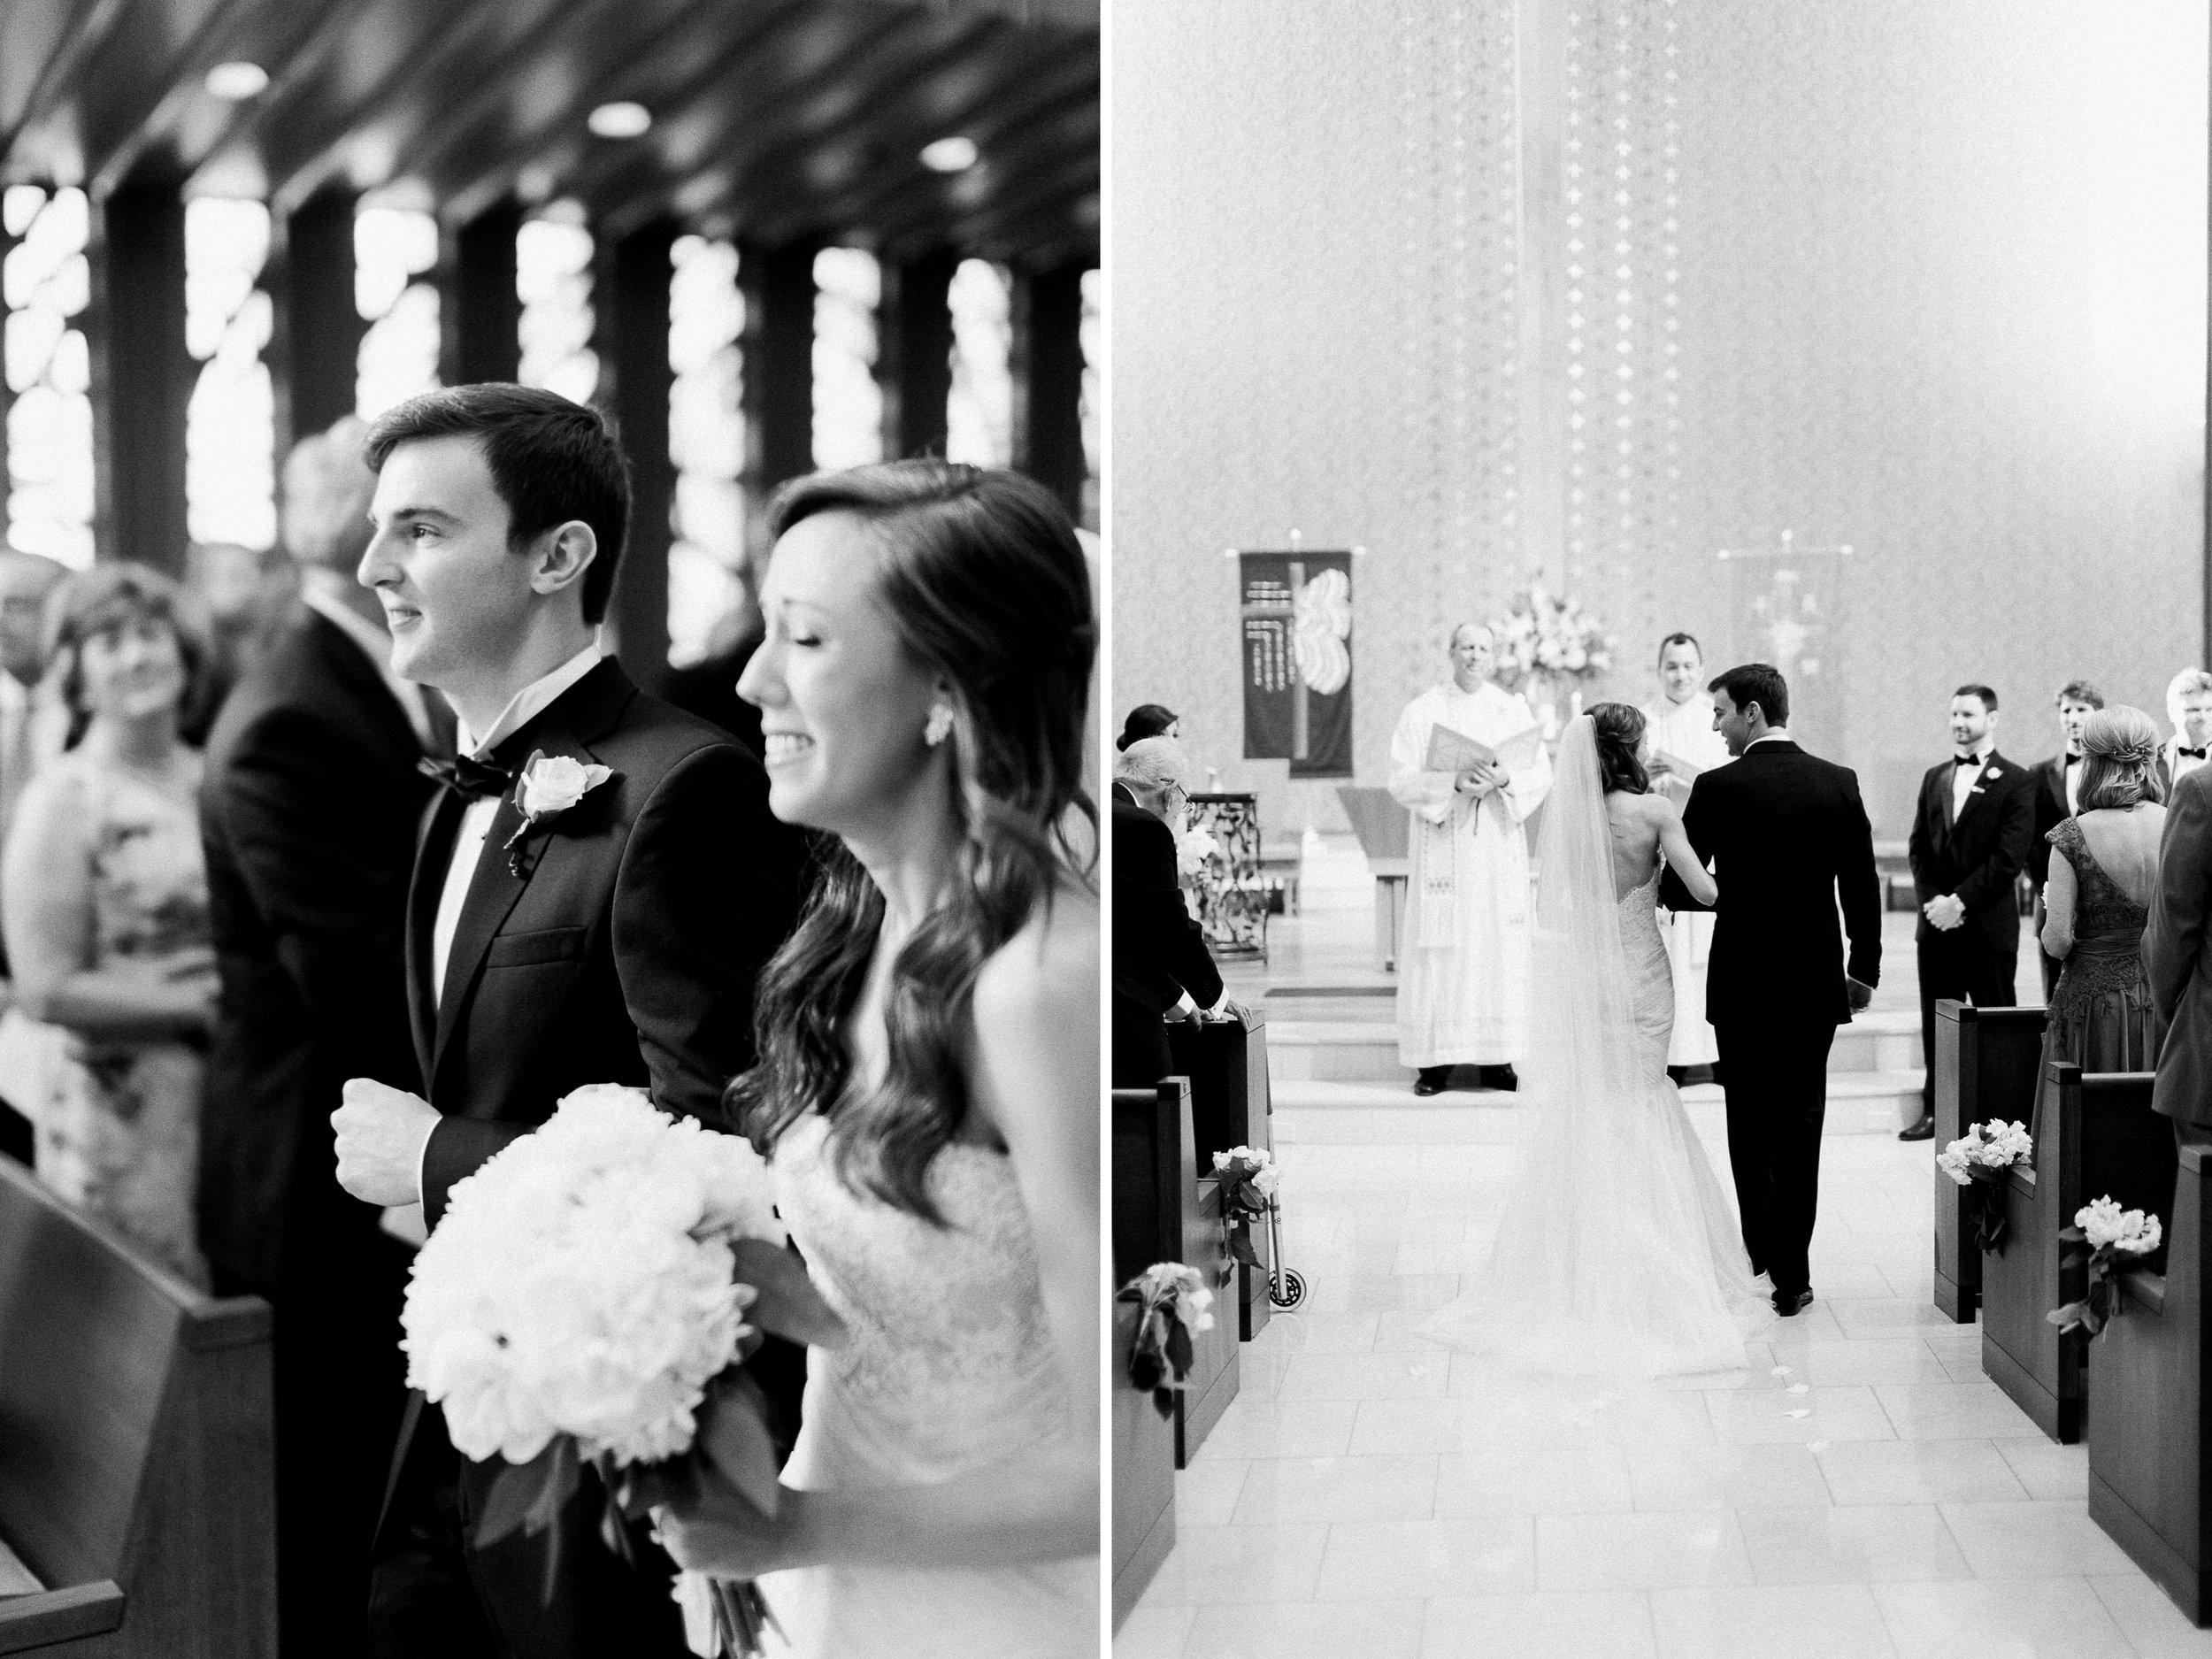 St.-Philip-Presbyterian-Church-Houston-Wedding-Ceremony-The-Junior-League-Of-Houston-Reception-Dana-Fernandez-Photography-Fine-Art-Film-121.jpg